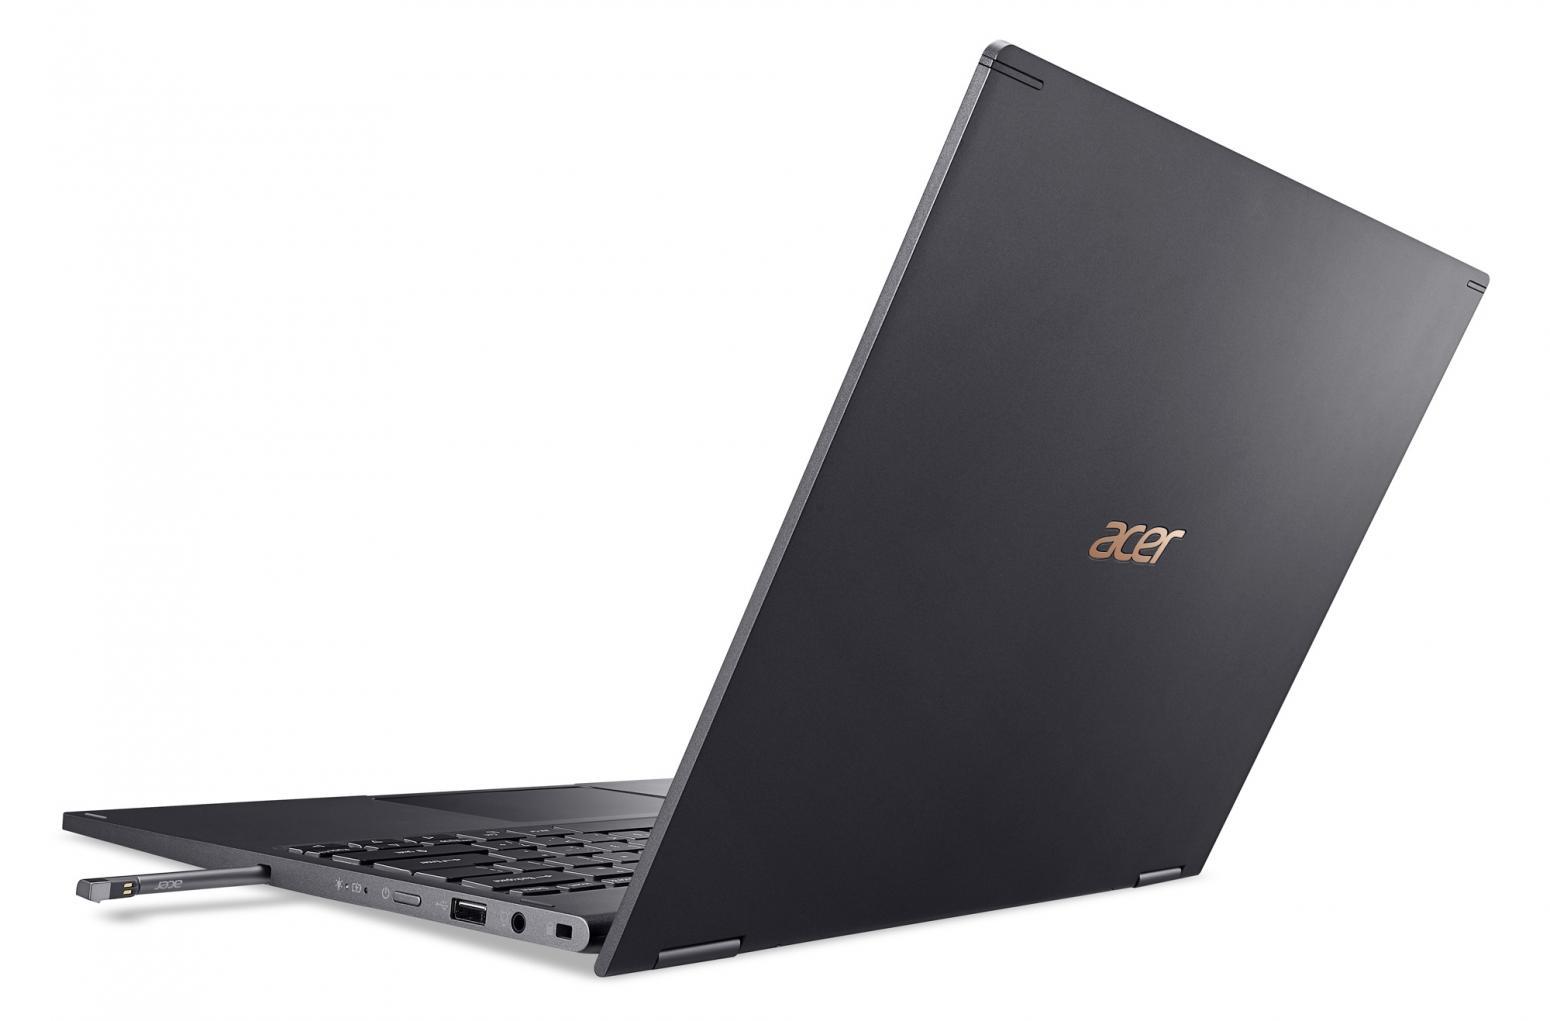 Ordinateur portable Acer Spin 5 SP513-54N-59ED Gris - QHD Tactile, Stylet - photo 9